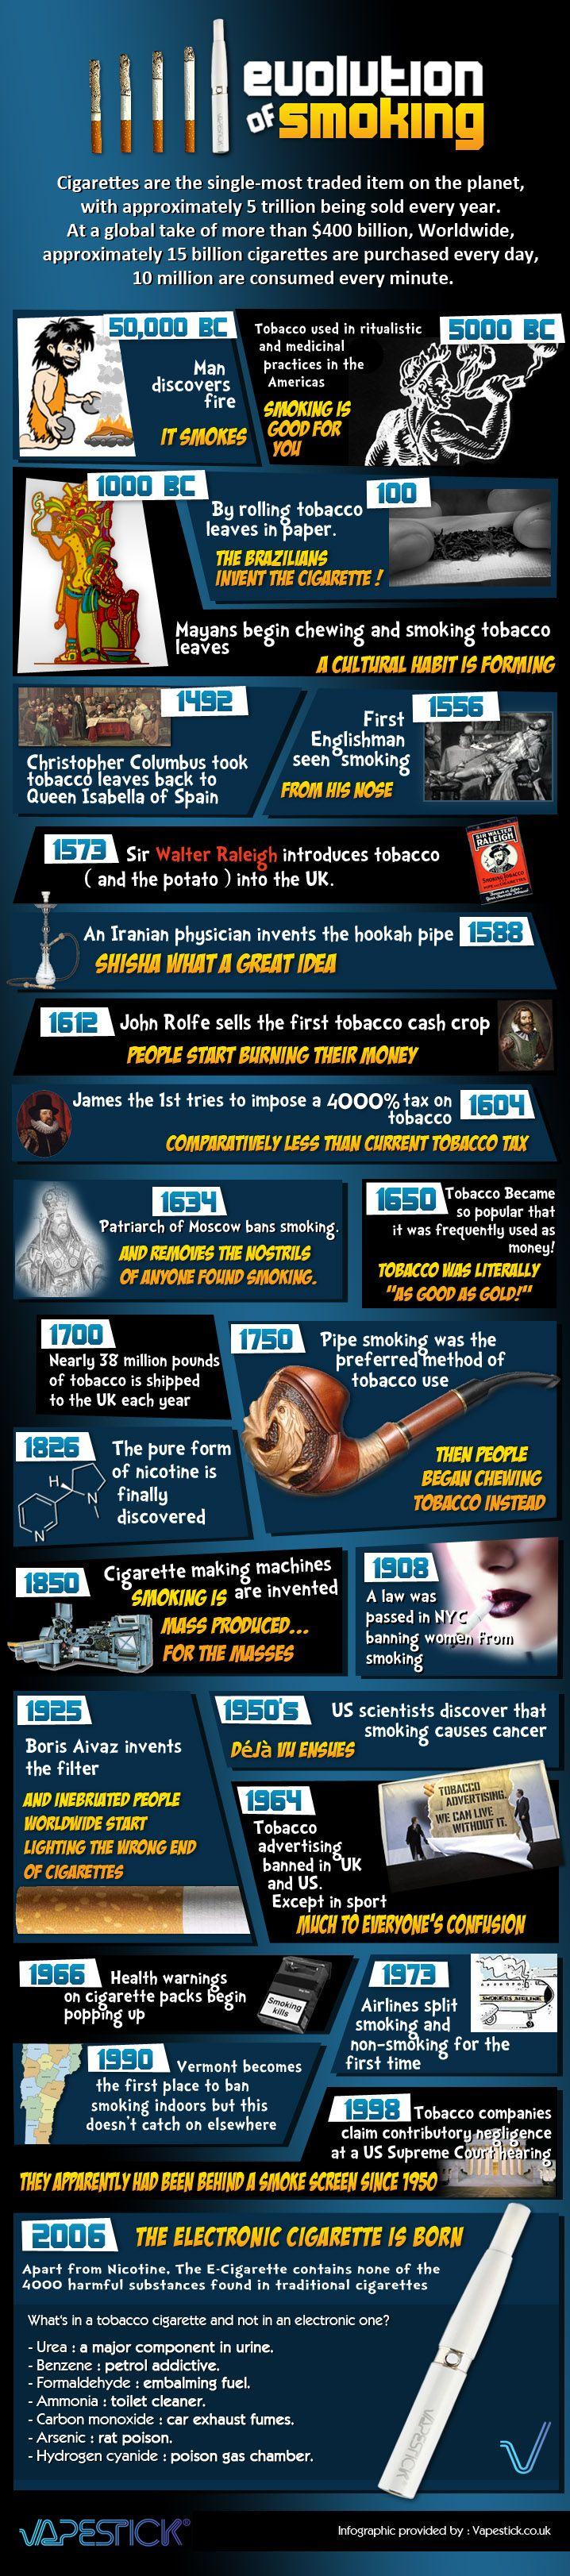 Evolution of Smoking #infographic